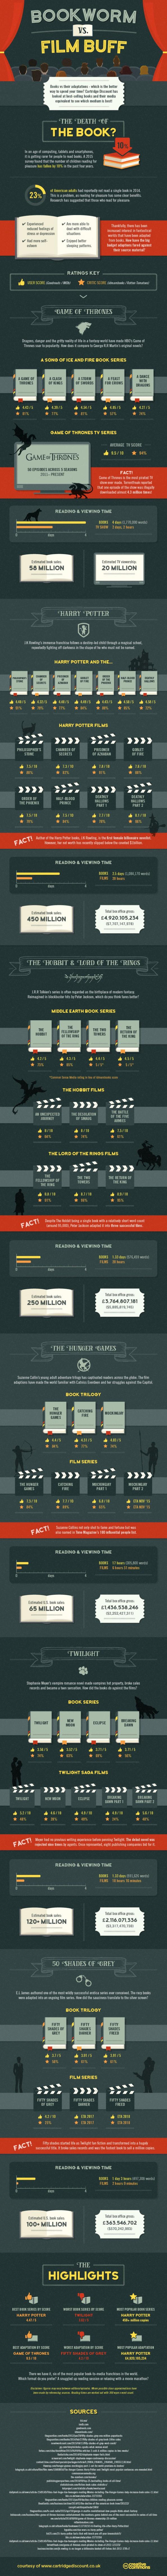 buch film infografik